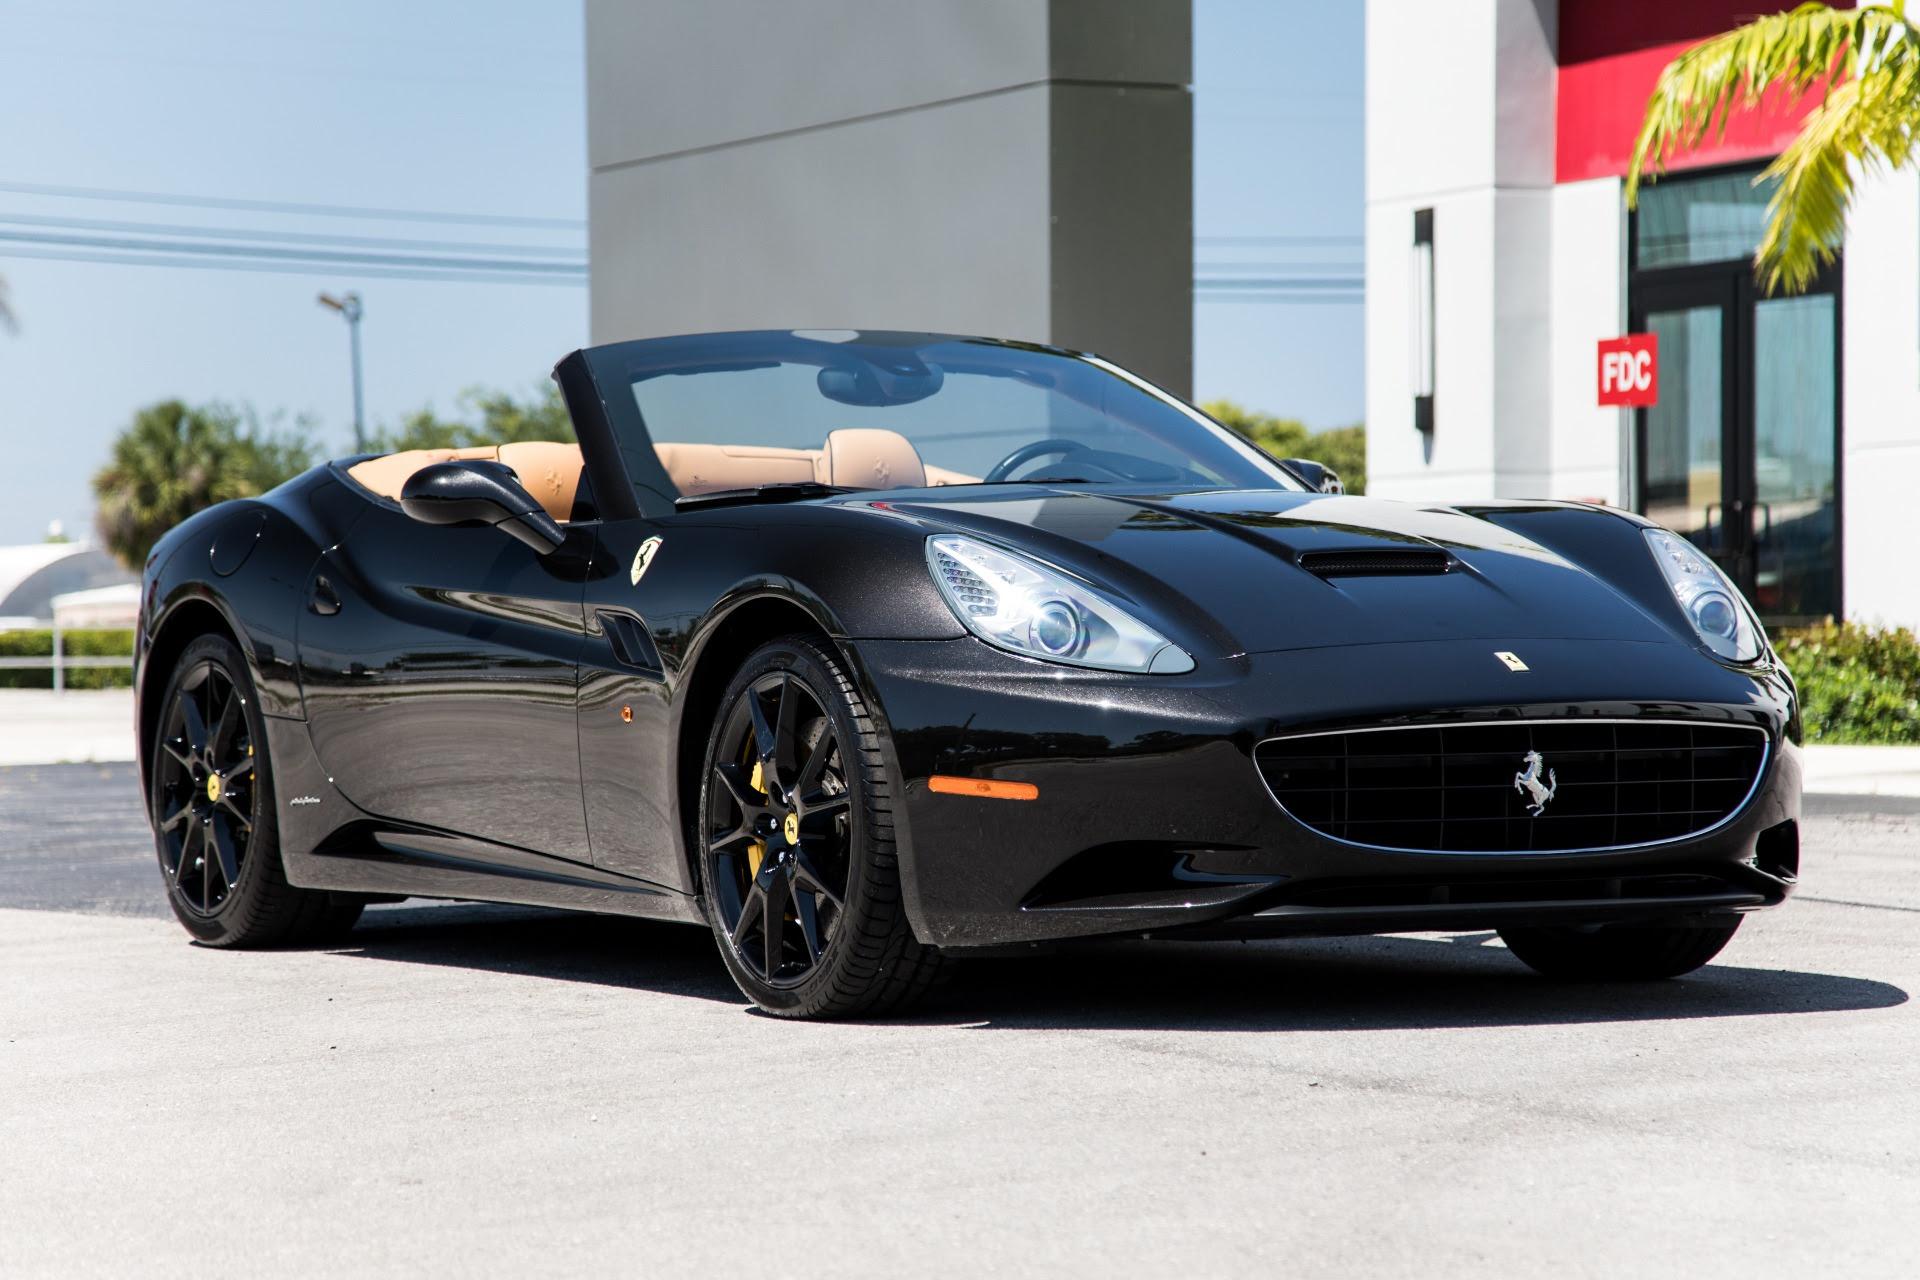 Used 2010 Ferrari California For Sale ($87,900)   Marino ...